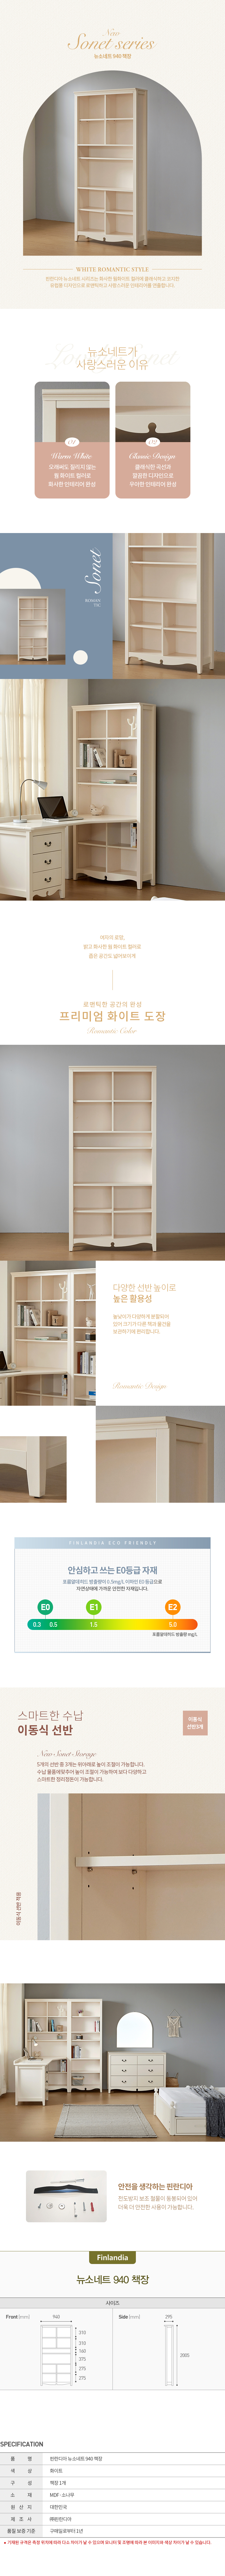 newsonet_bookshelf940.jpg